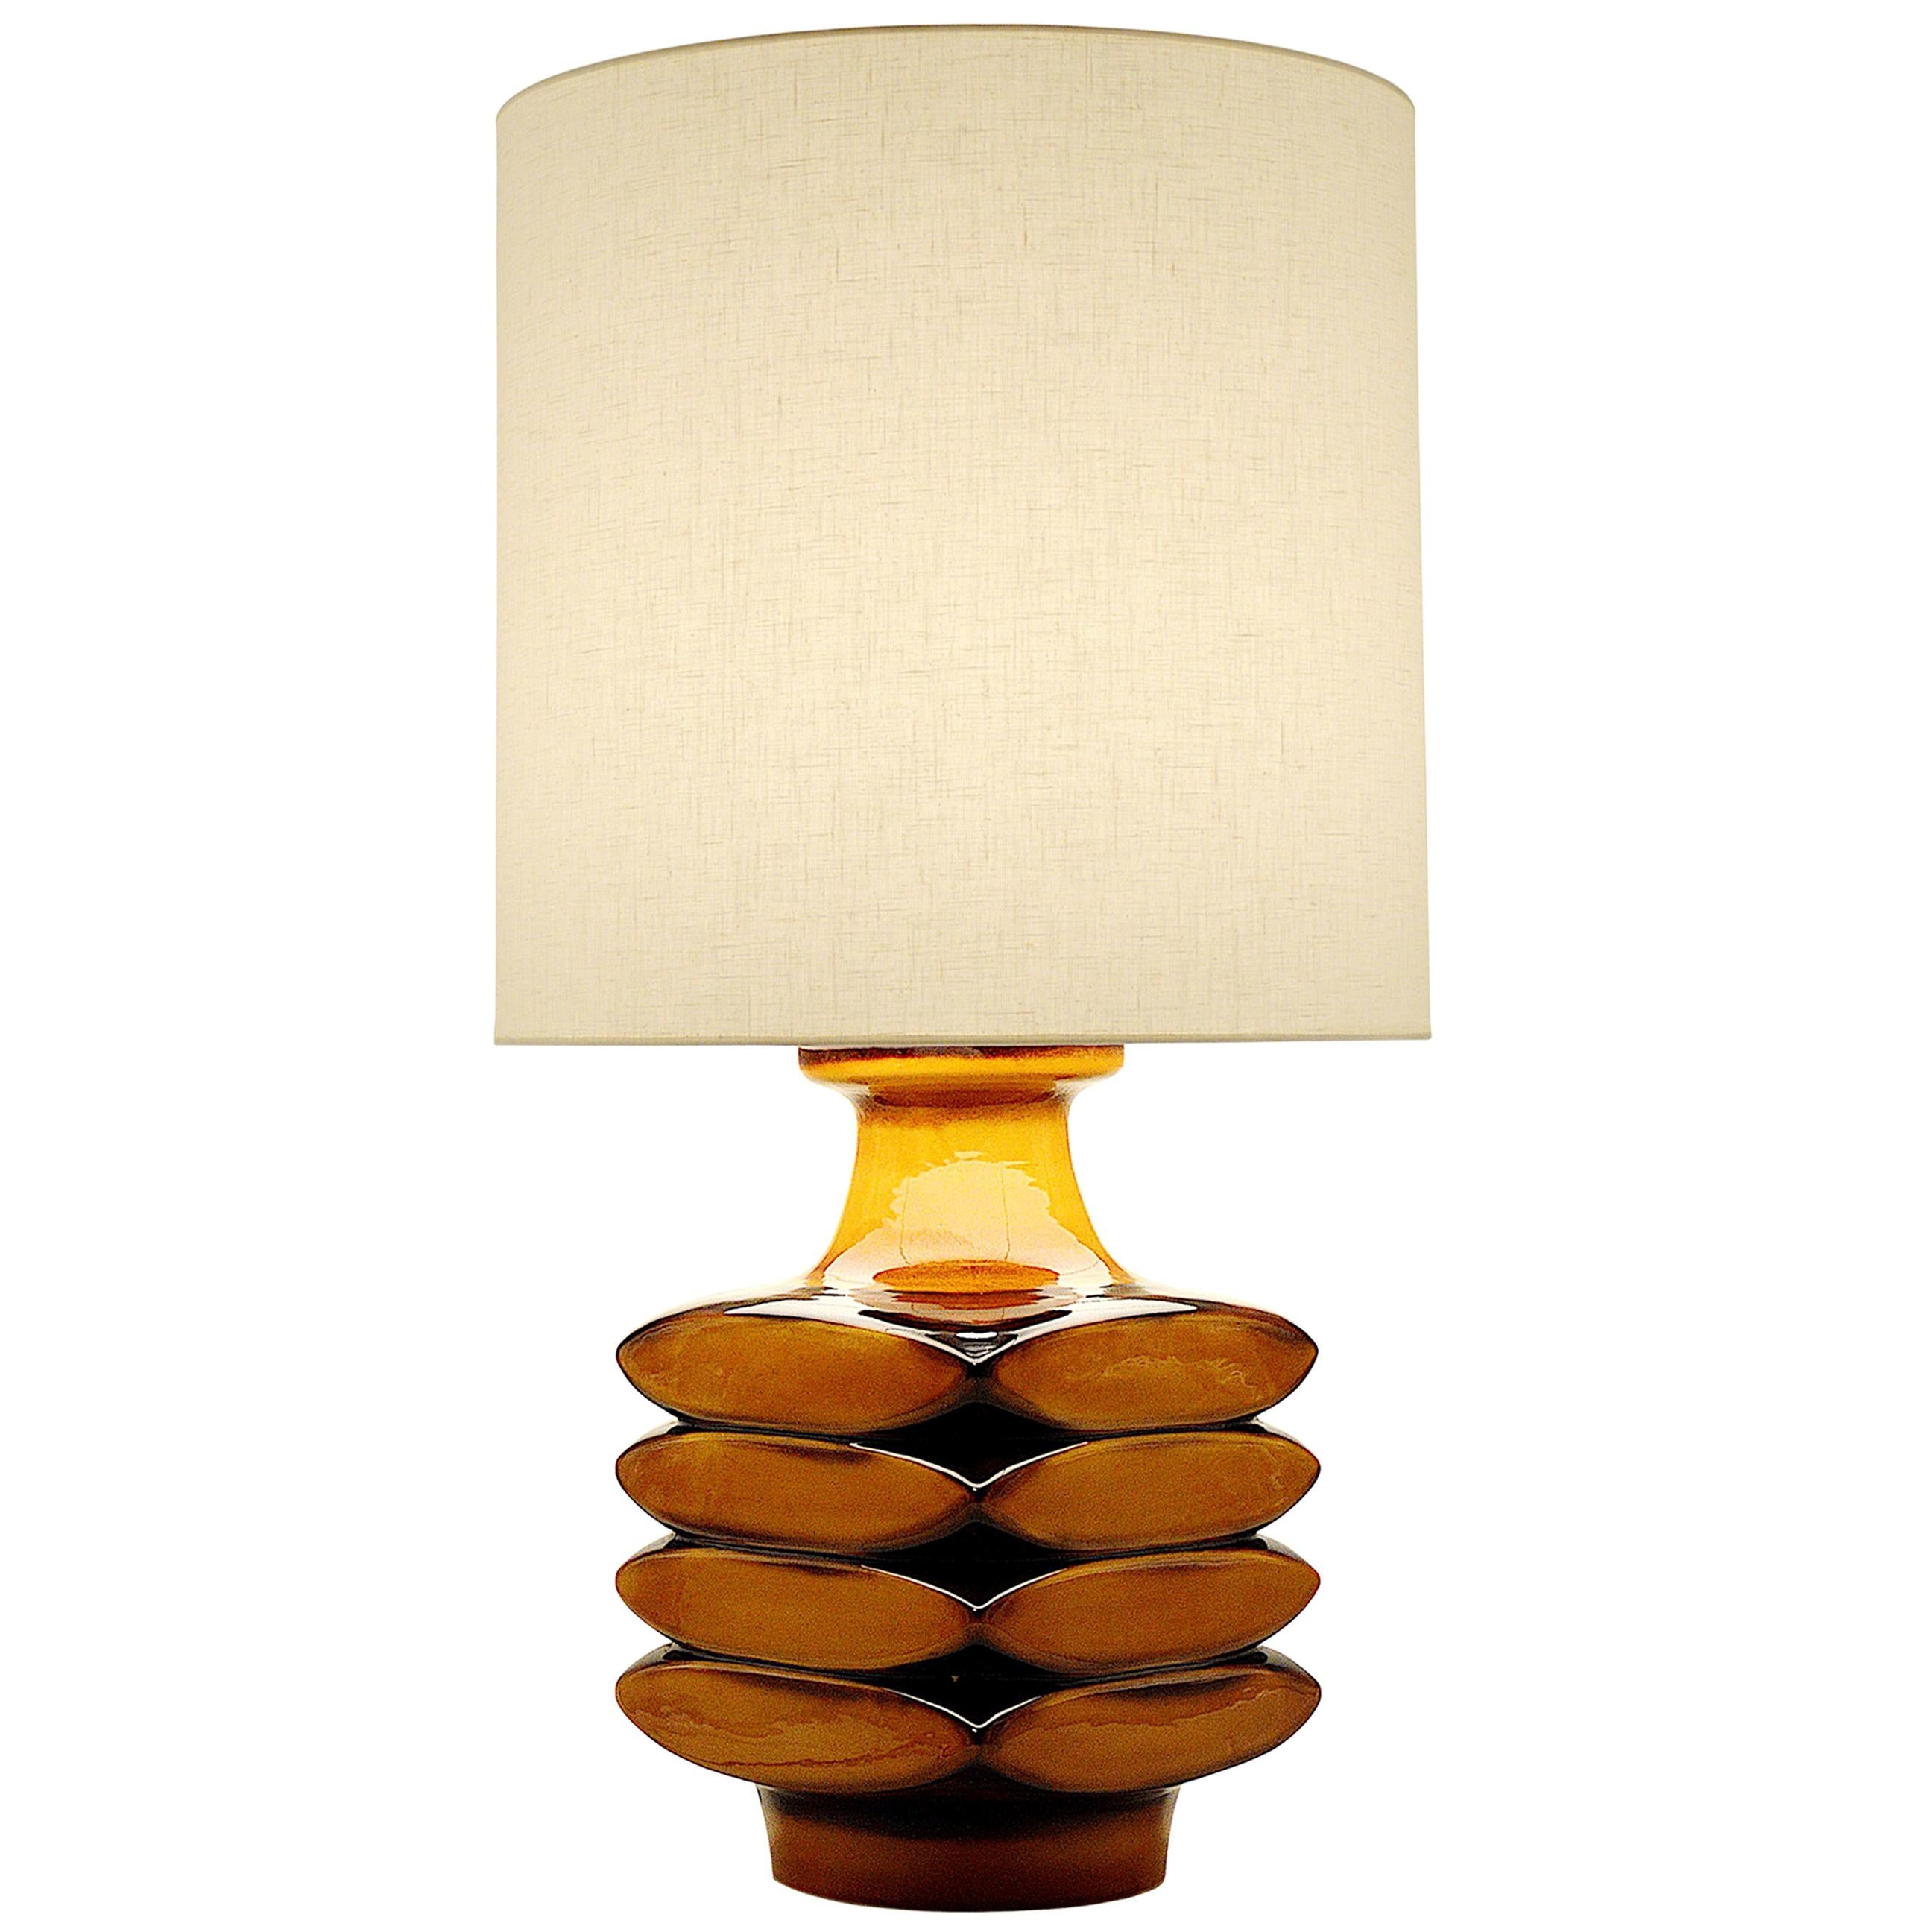 Midcentury Ceramic Table or Floor Lamp, 1960s